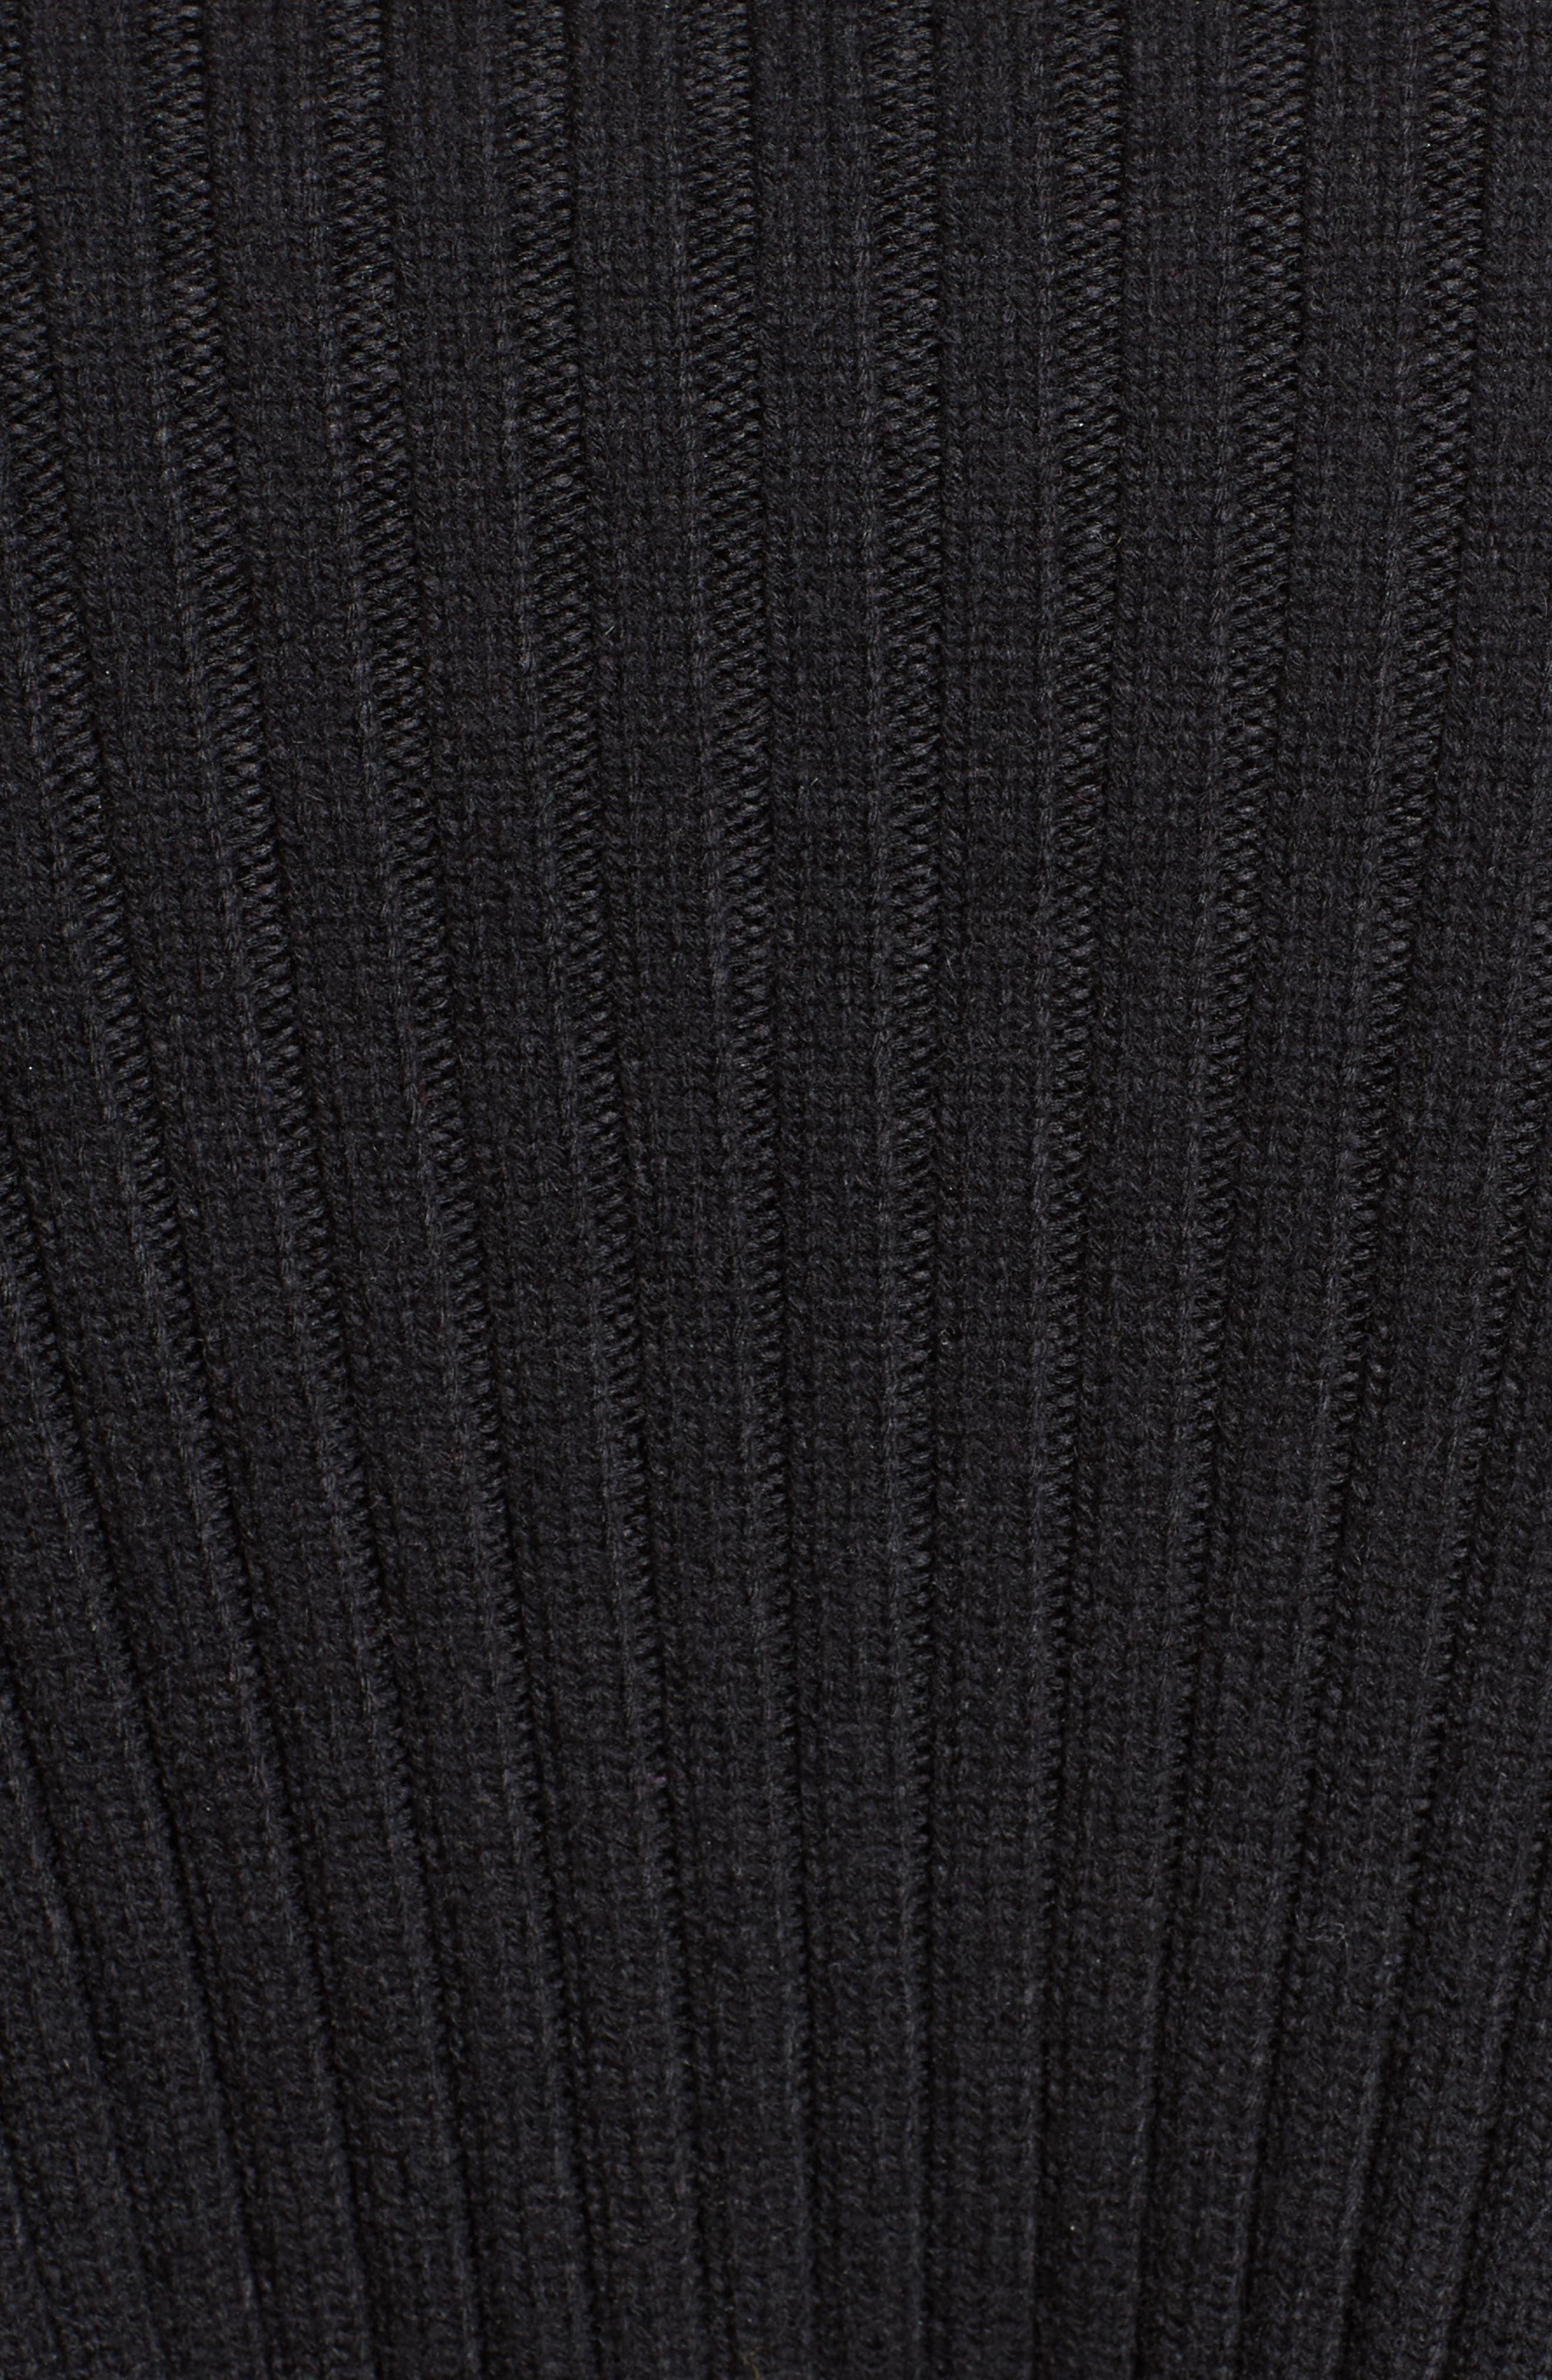 Wool & Cashmere Blend Turtleneck Dress,                             Alternate thumbnail 5, color,                             001